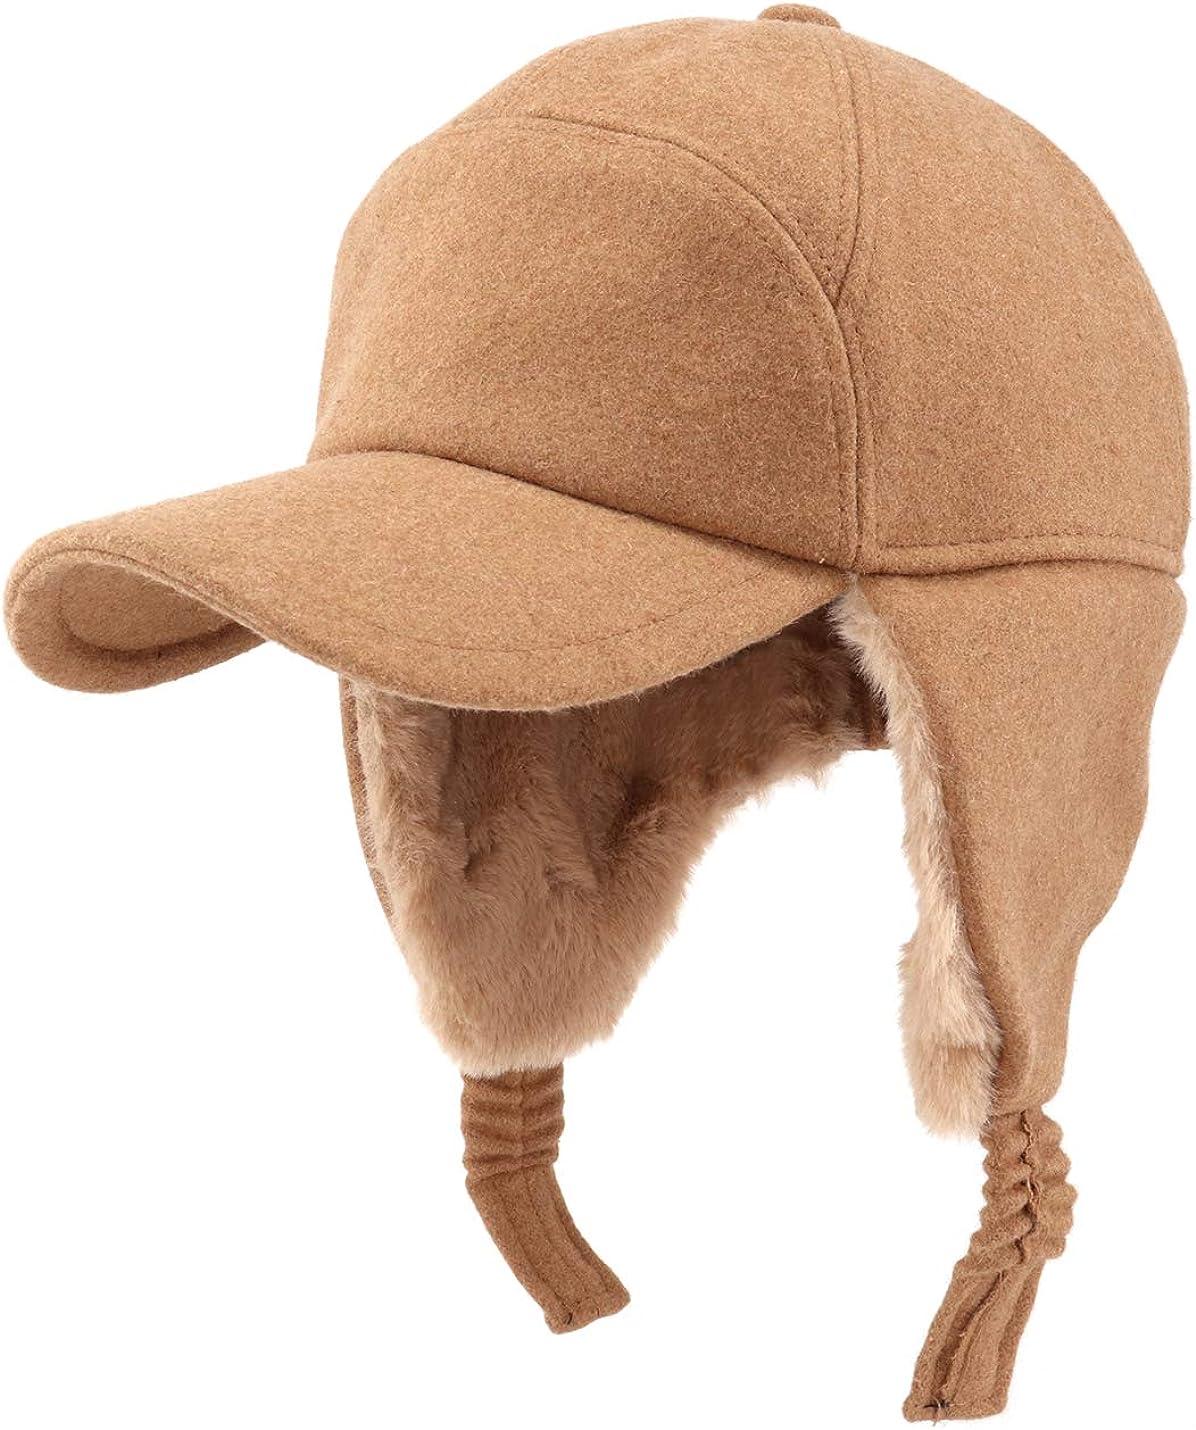 Nashville-Davidson Mall Gisdanchz Foldable Woolen Military Flat Sales results No. 1 Berber Flee with Top Hat